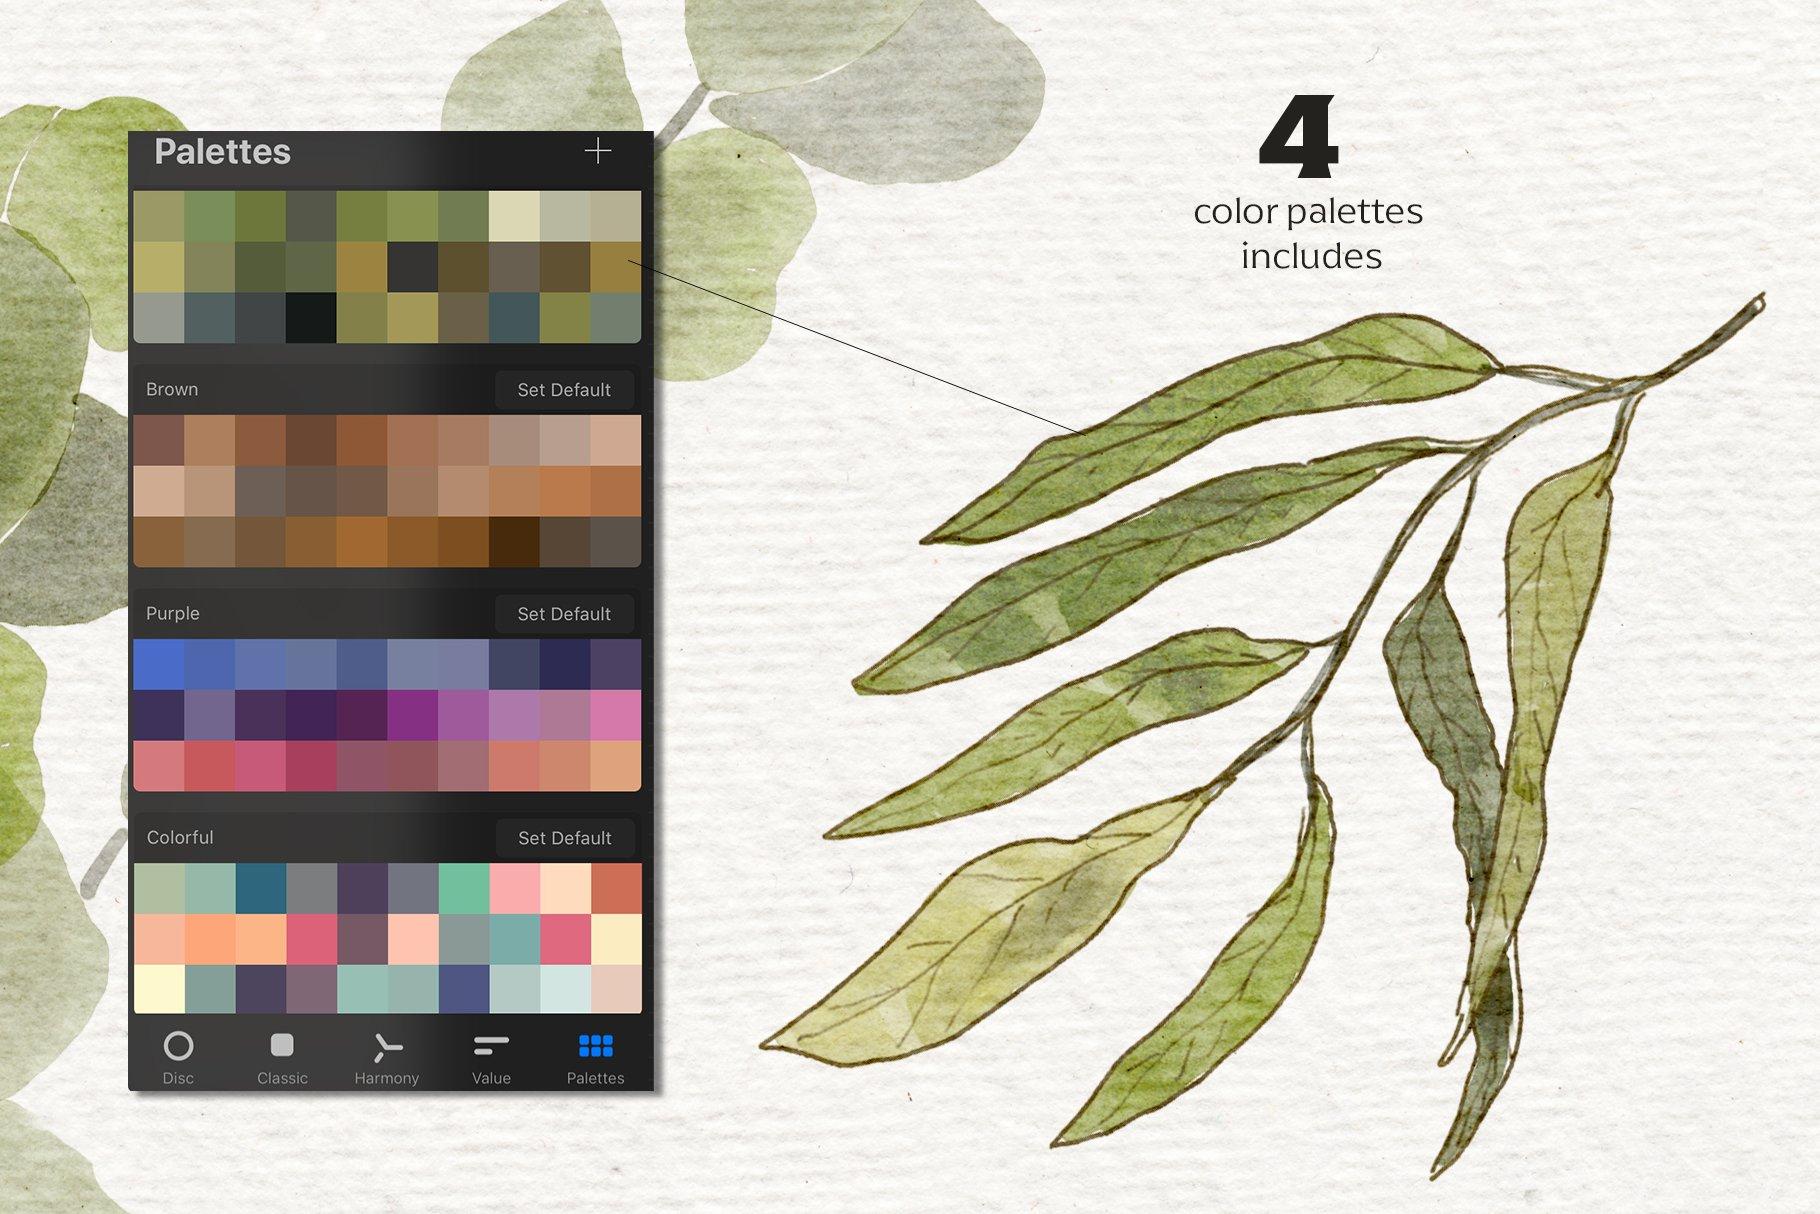 14款水彩铅笔Procreate笔刷包 Watercolor & Pencil Procreate brushes插图(2)